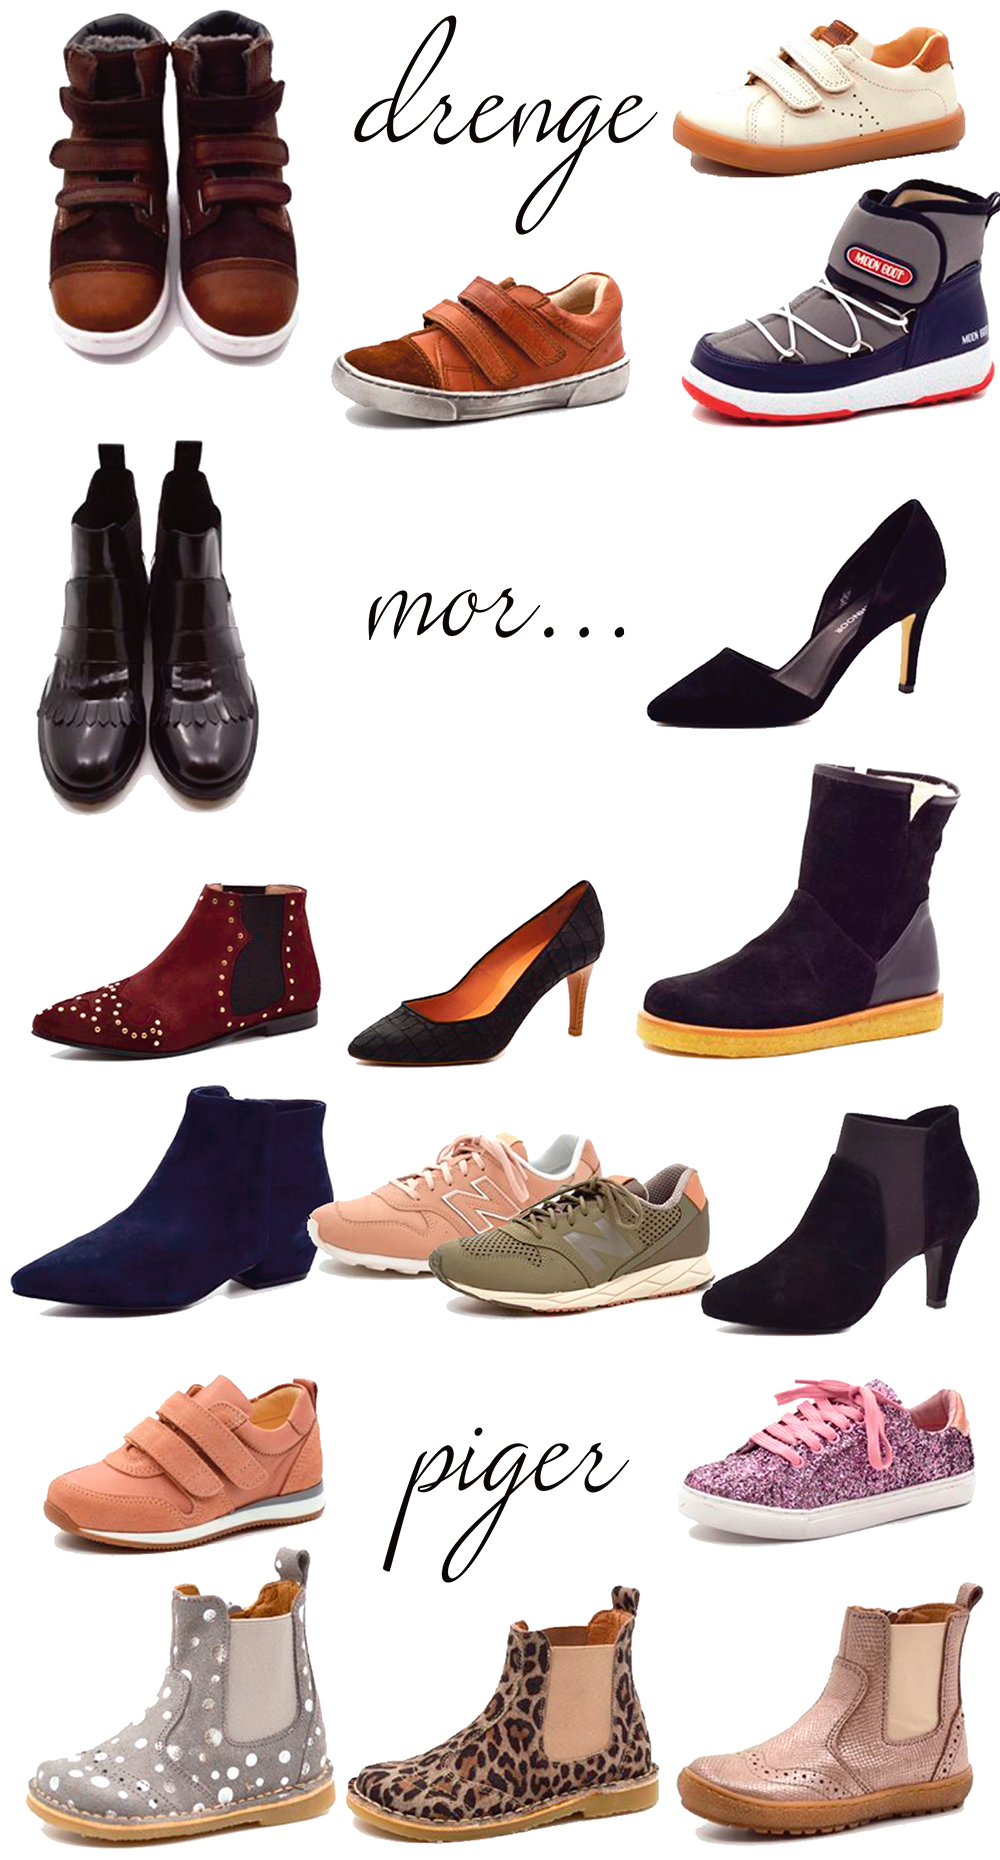 457cae67d4a Vind valgfrit par sko til mor og barn fra Growing Feet - Dorte Bak